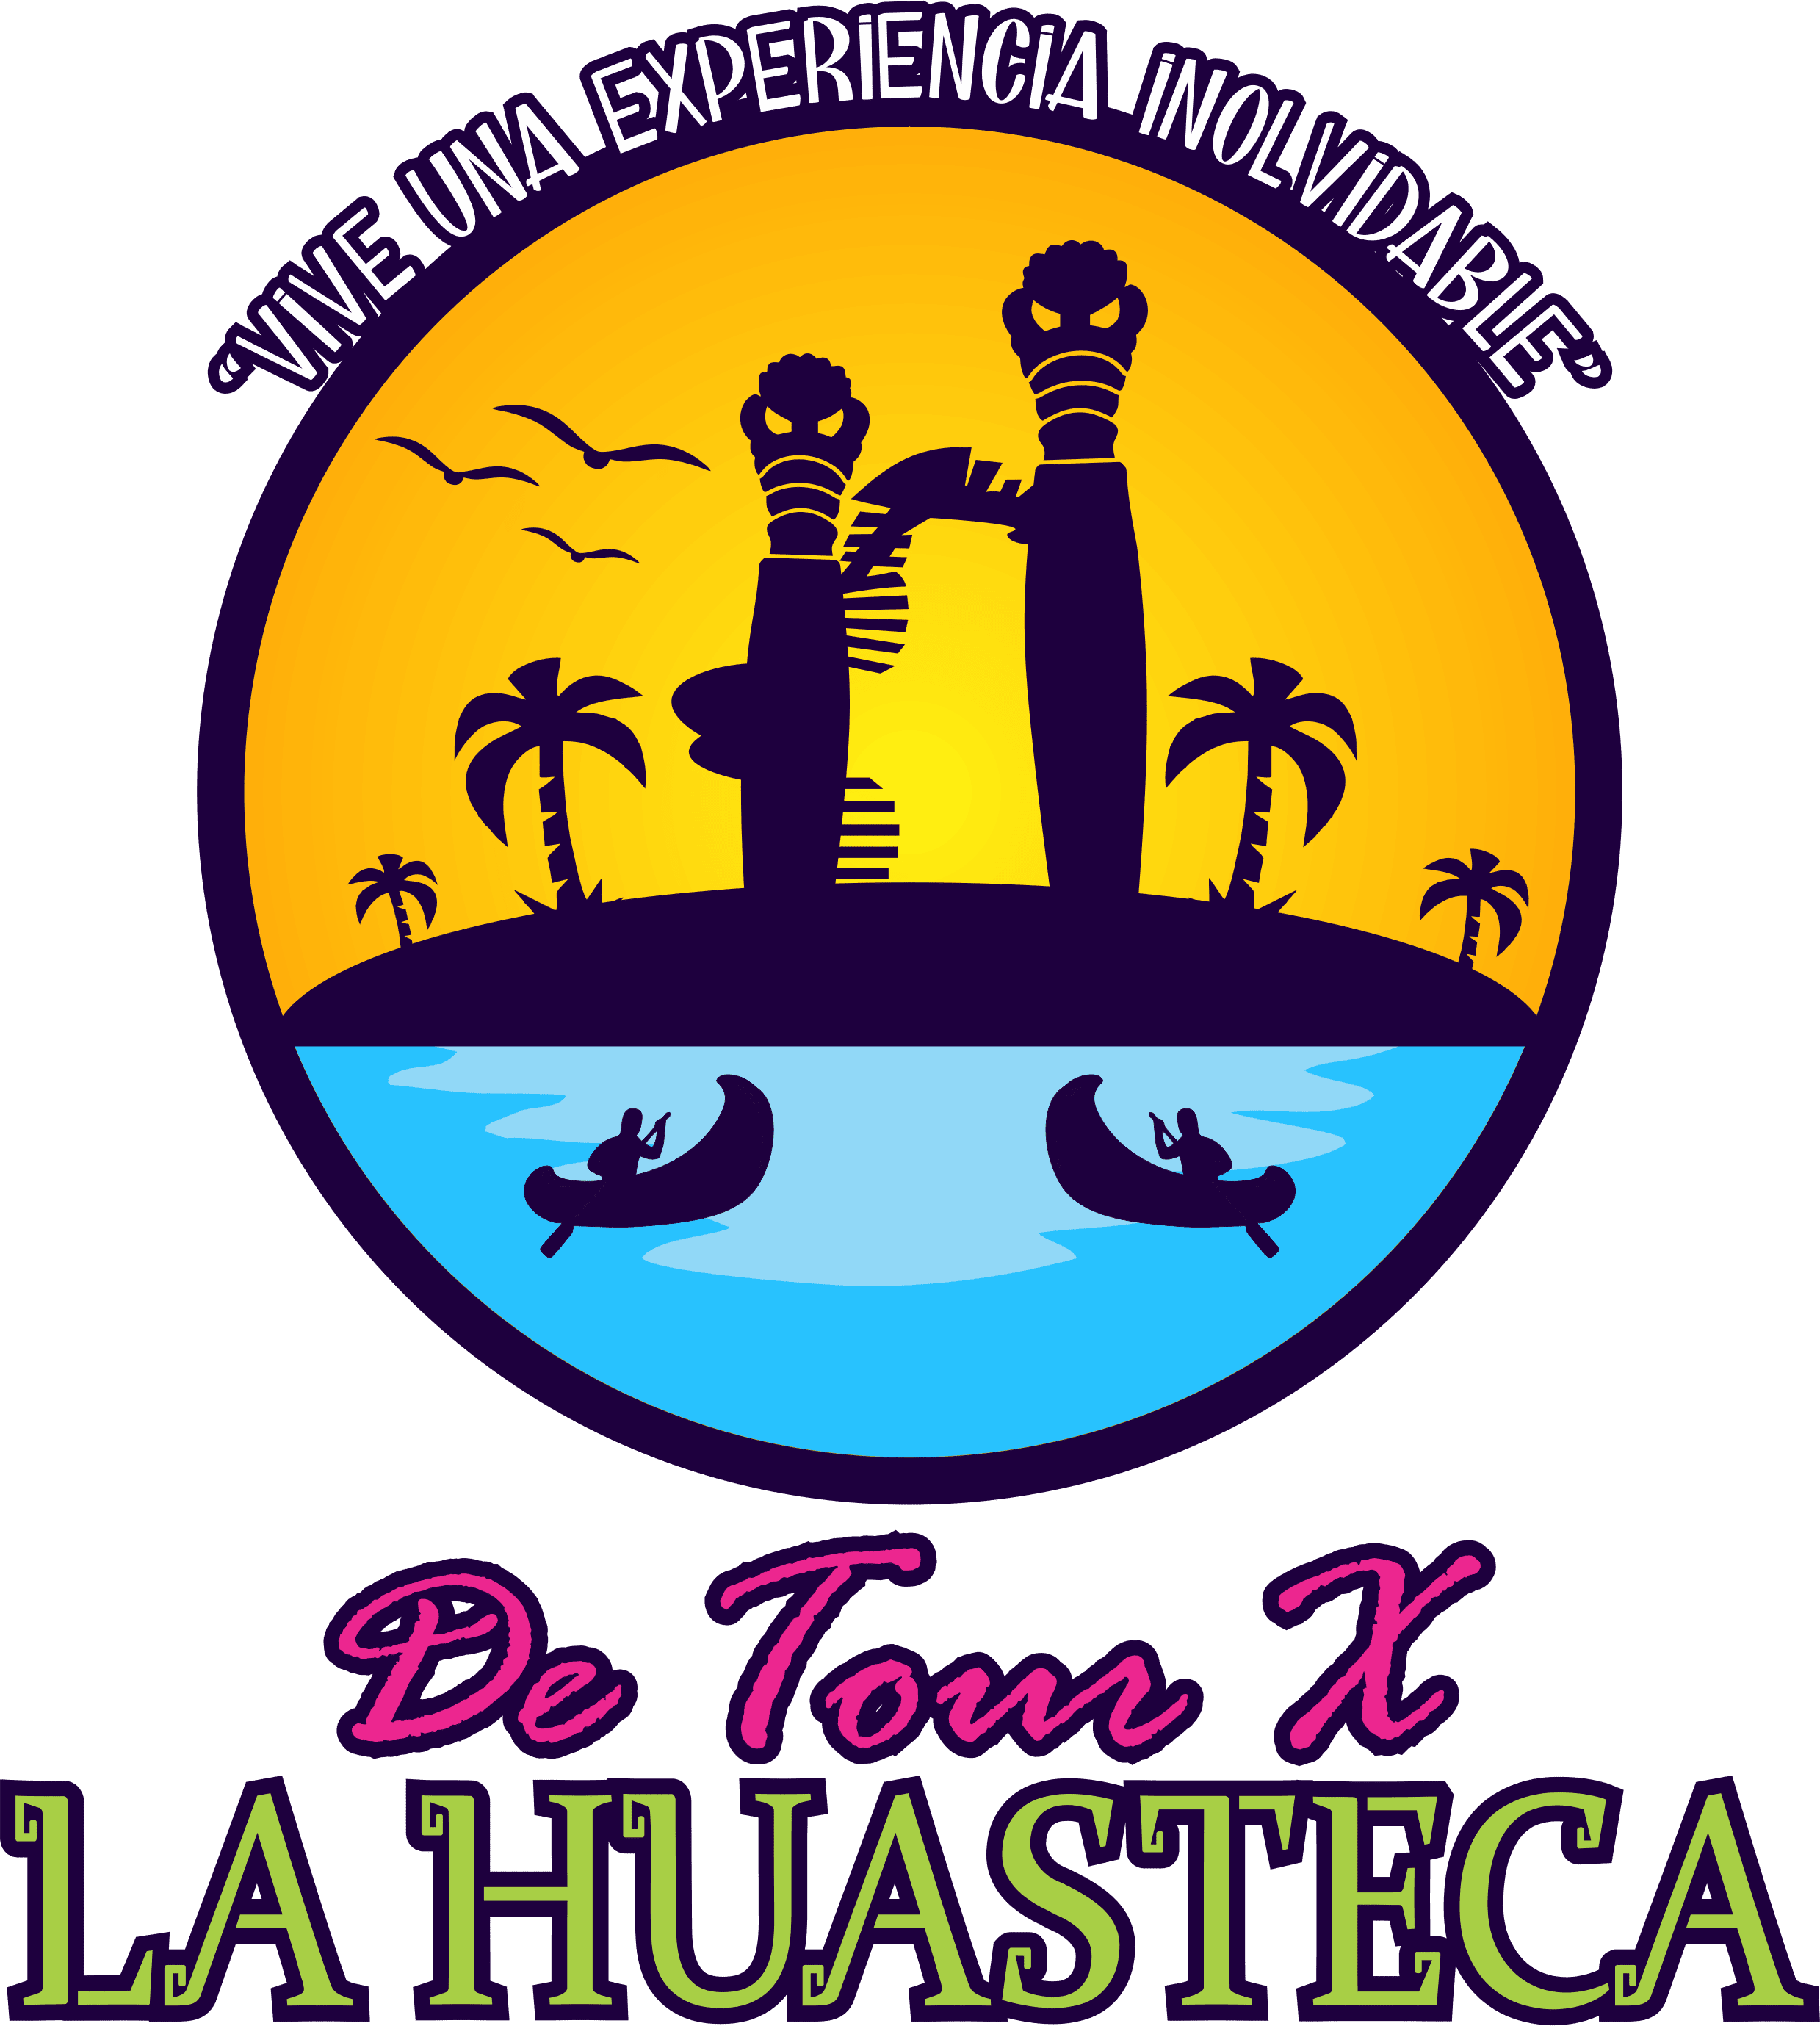 De Tour Xlahuasteca